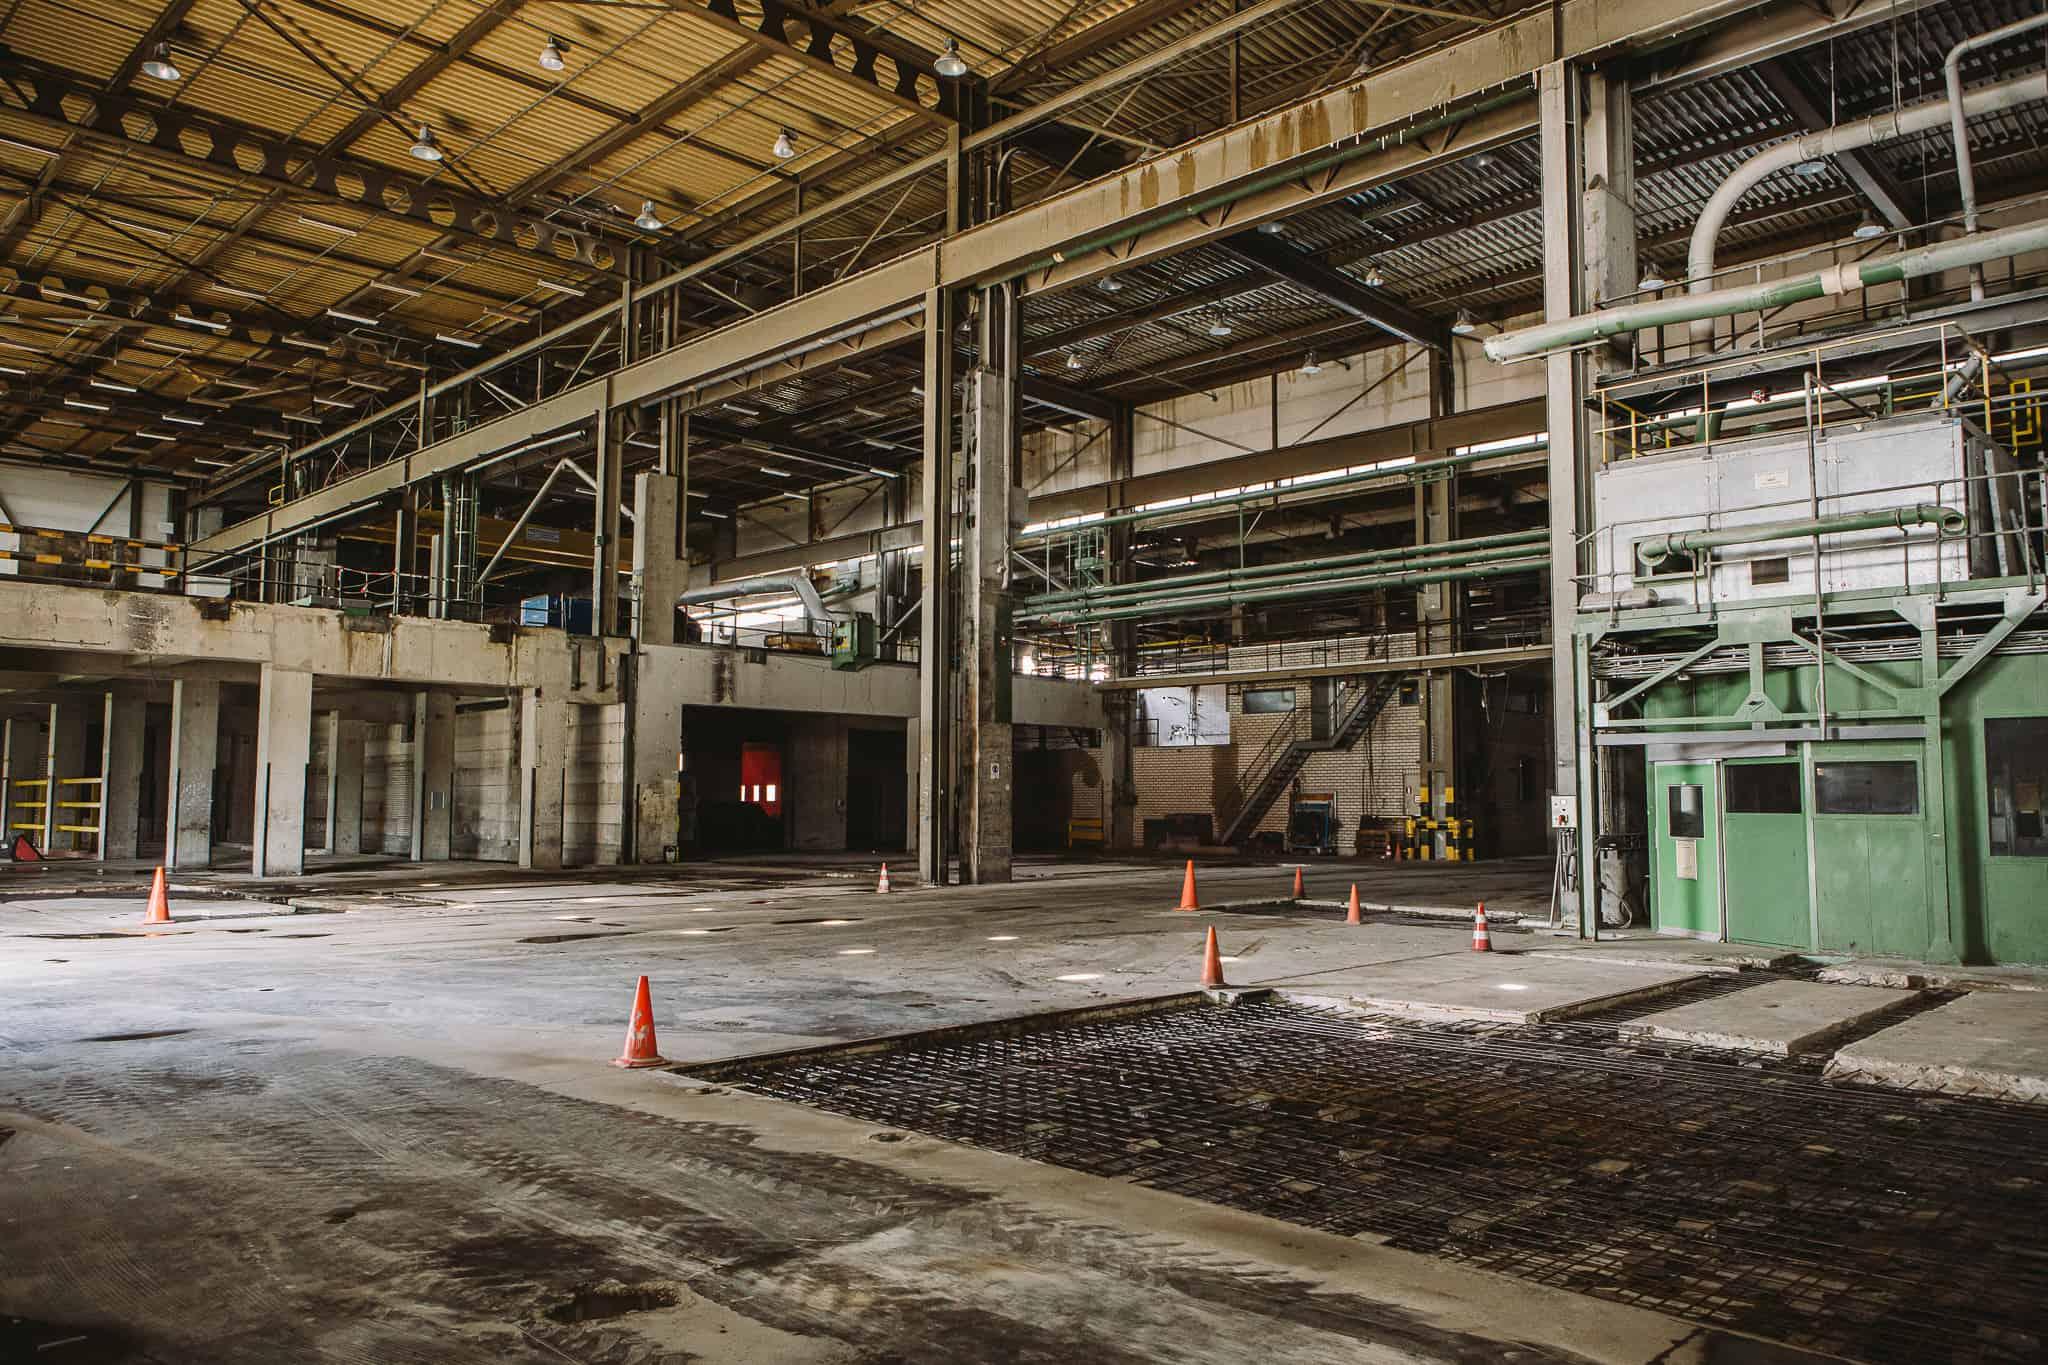 EKI_Nijmegen_27 - papierfabriek - industreel - locatie